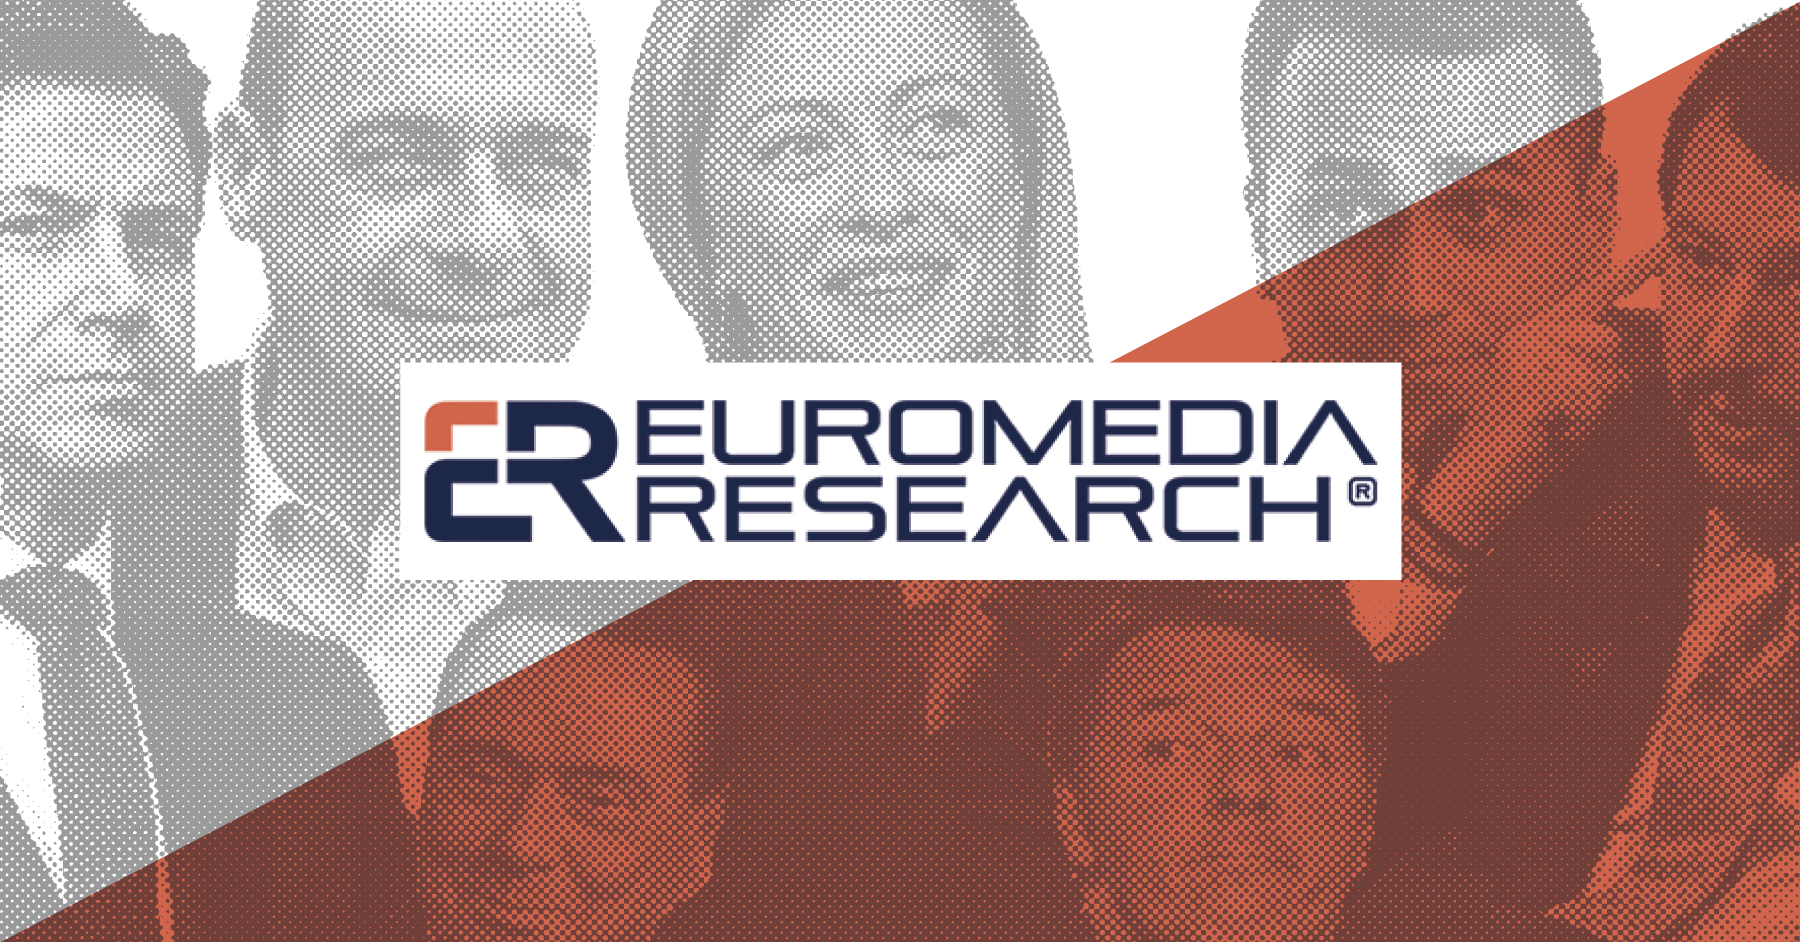 sondaggi euromedia, sondaggi elettorali euromedia